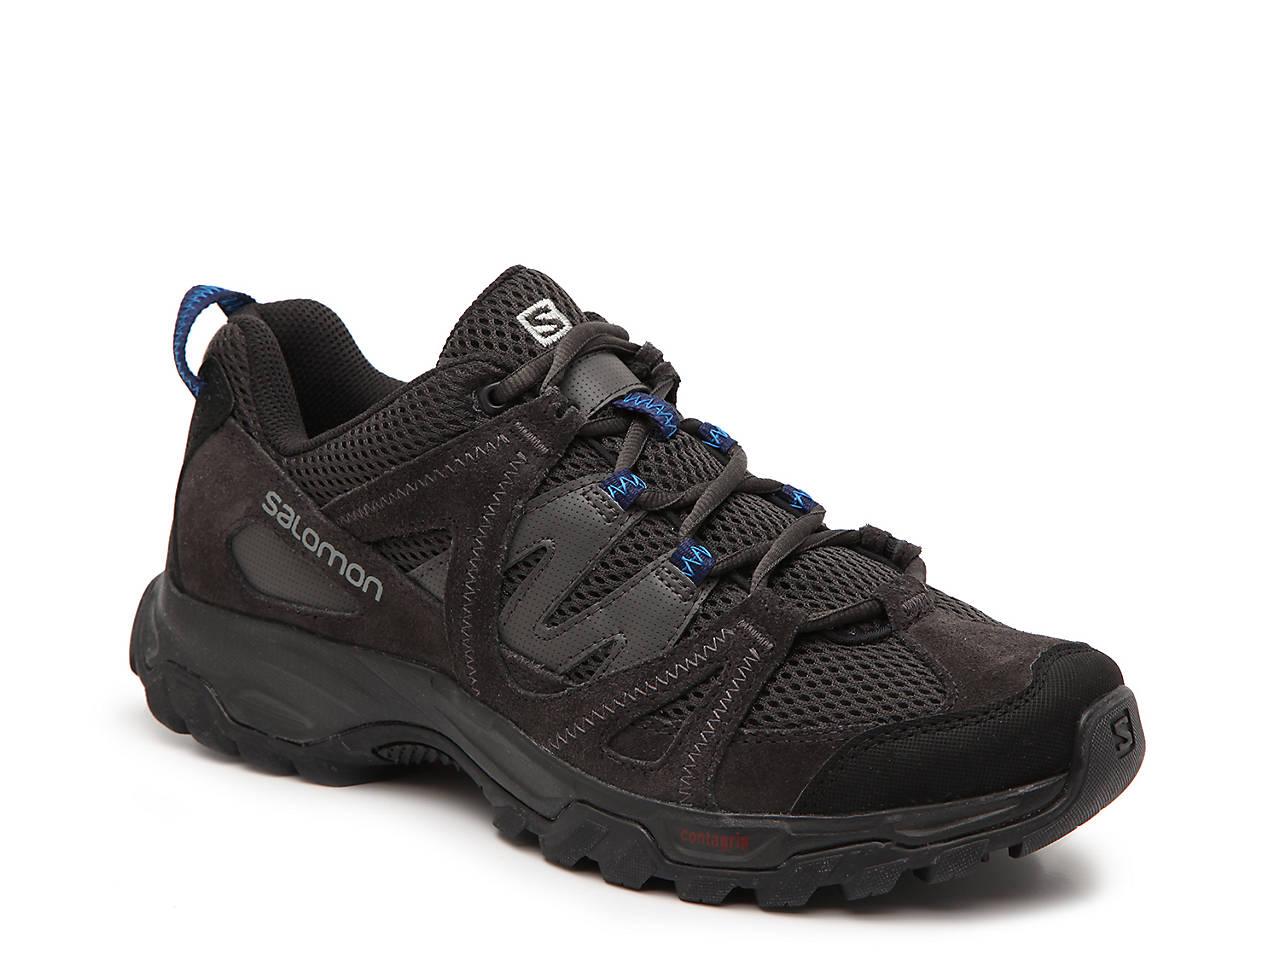 636e6b67 Kinchega 2 Hiking Shoe